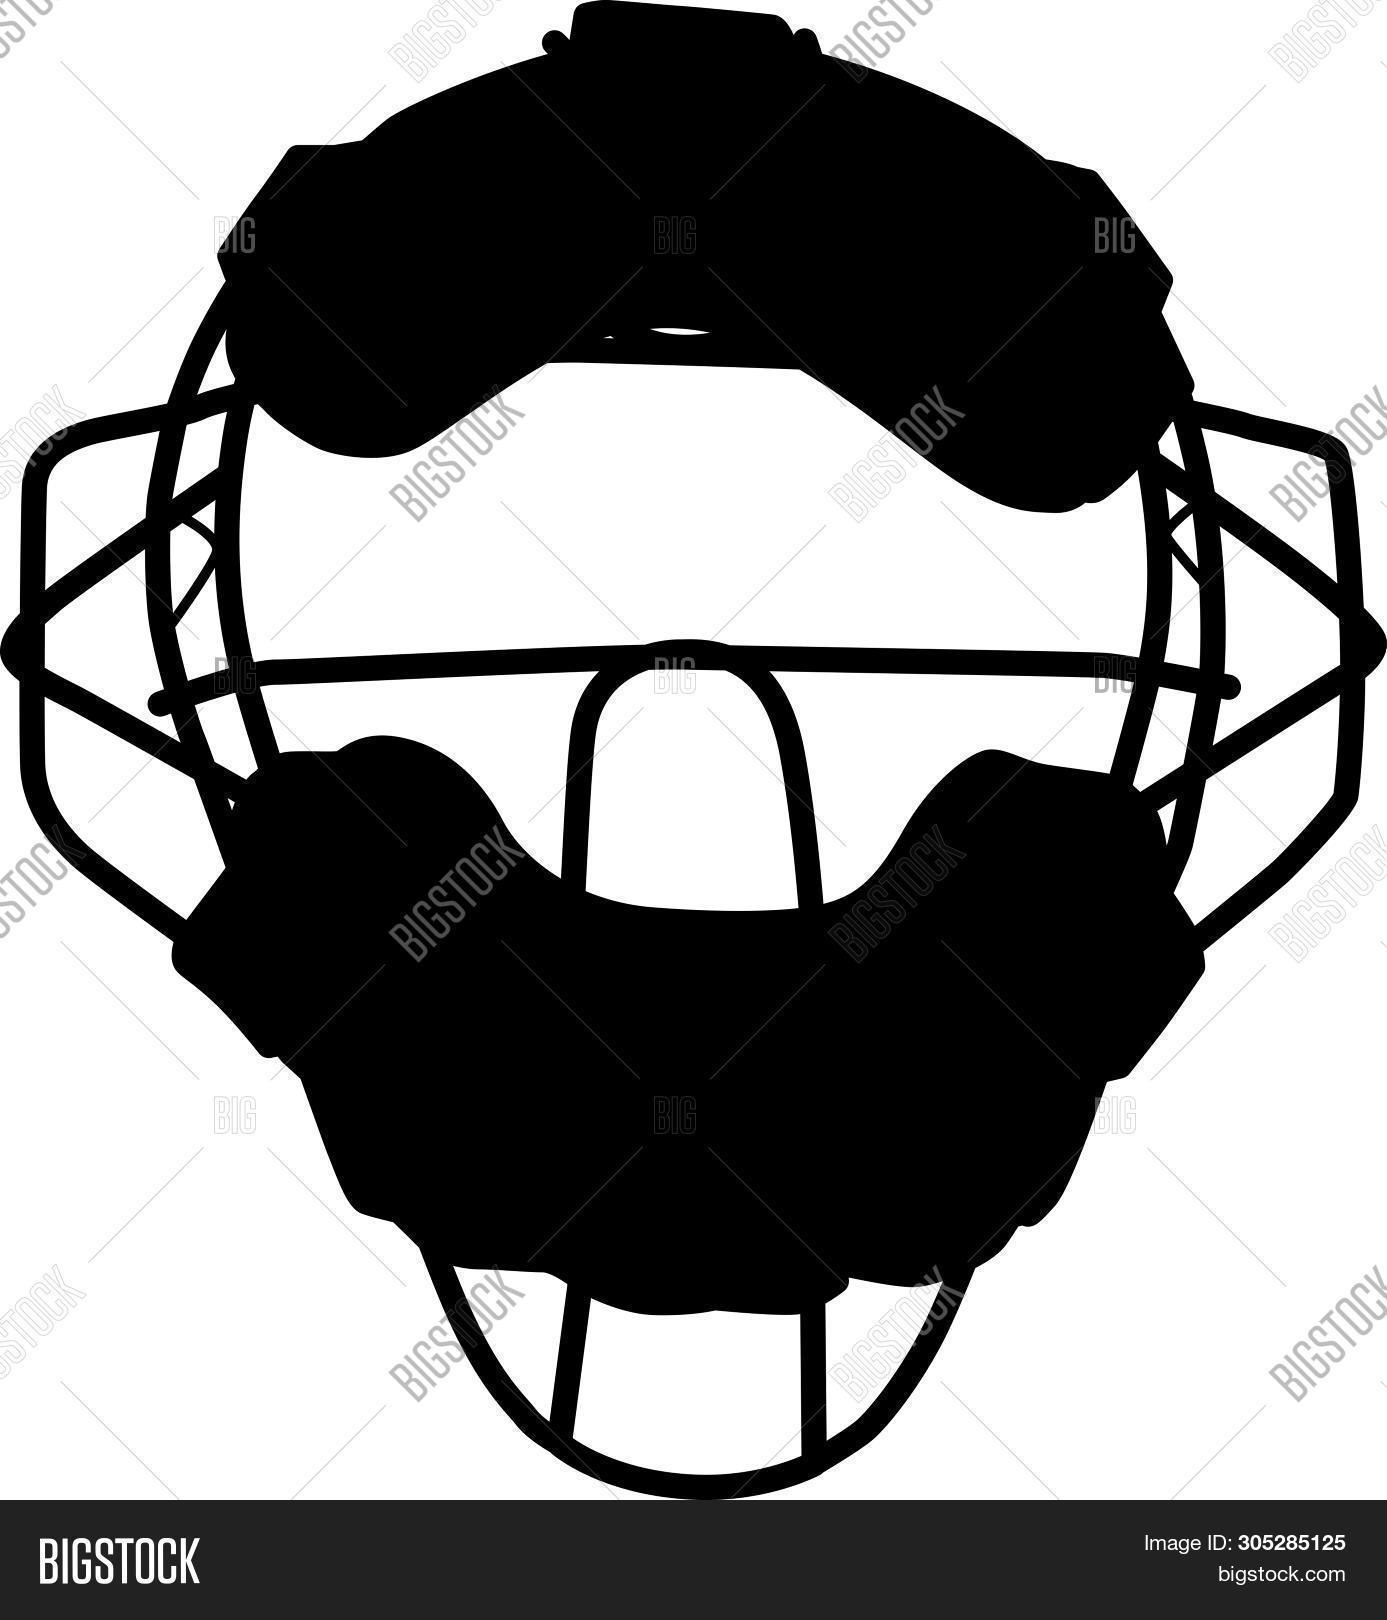 Baseball / Softball Vector & Photo (Free Trial).